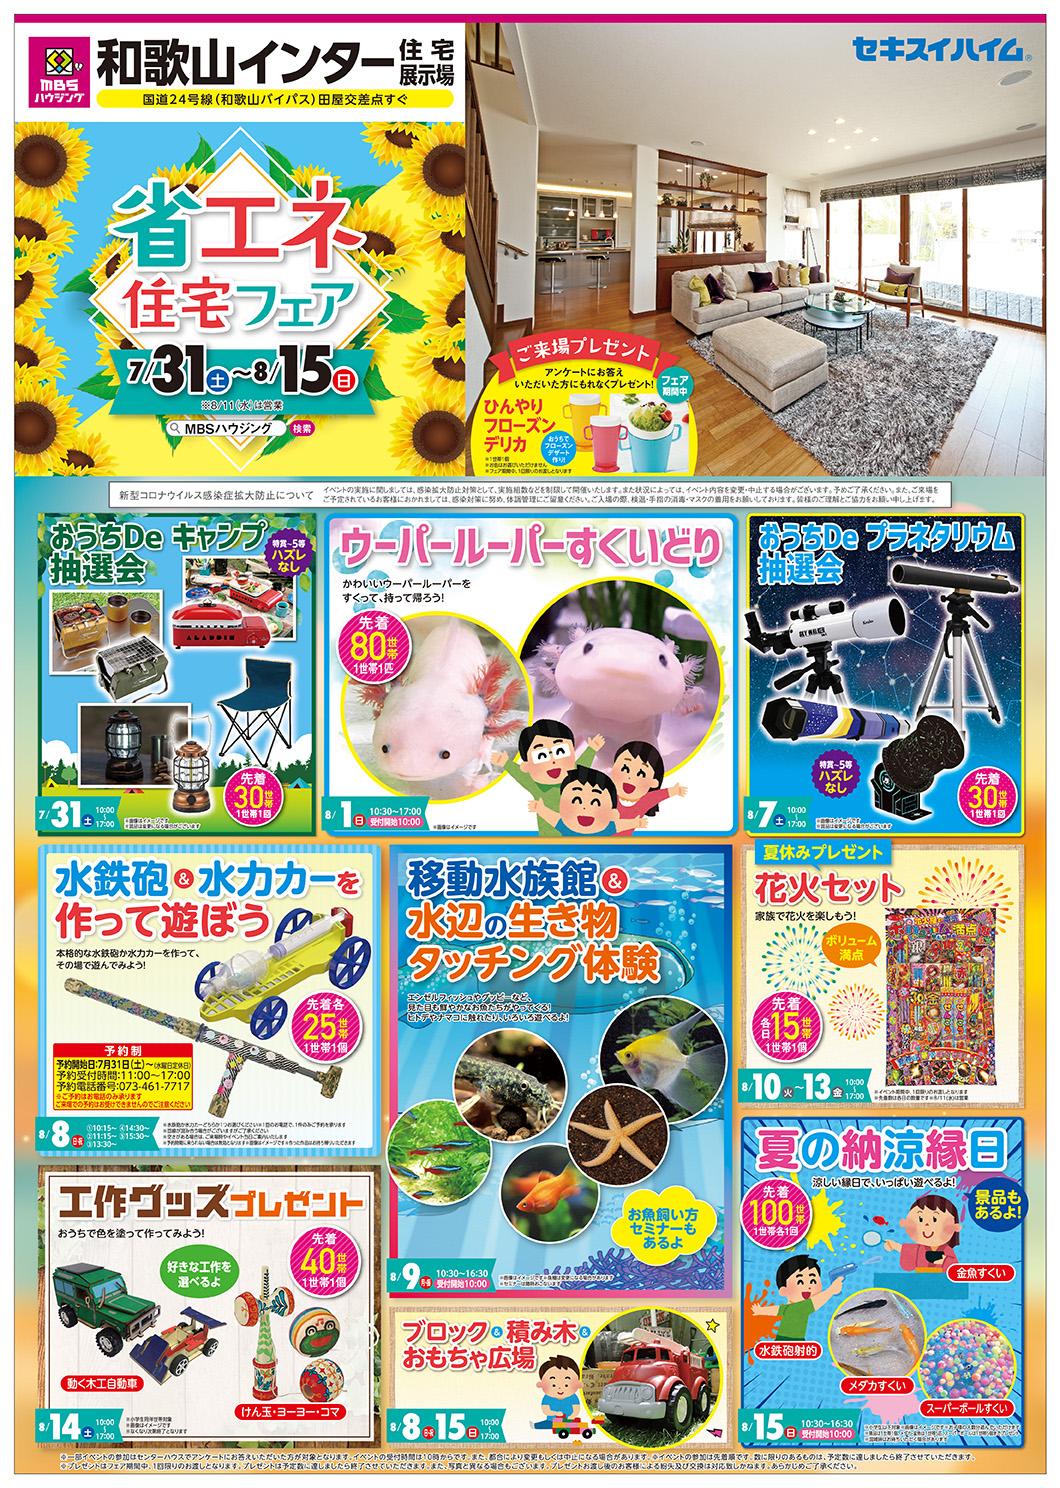 210731mbs_wakayama_omote_out.jpg